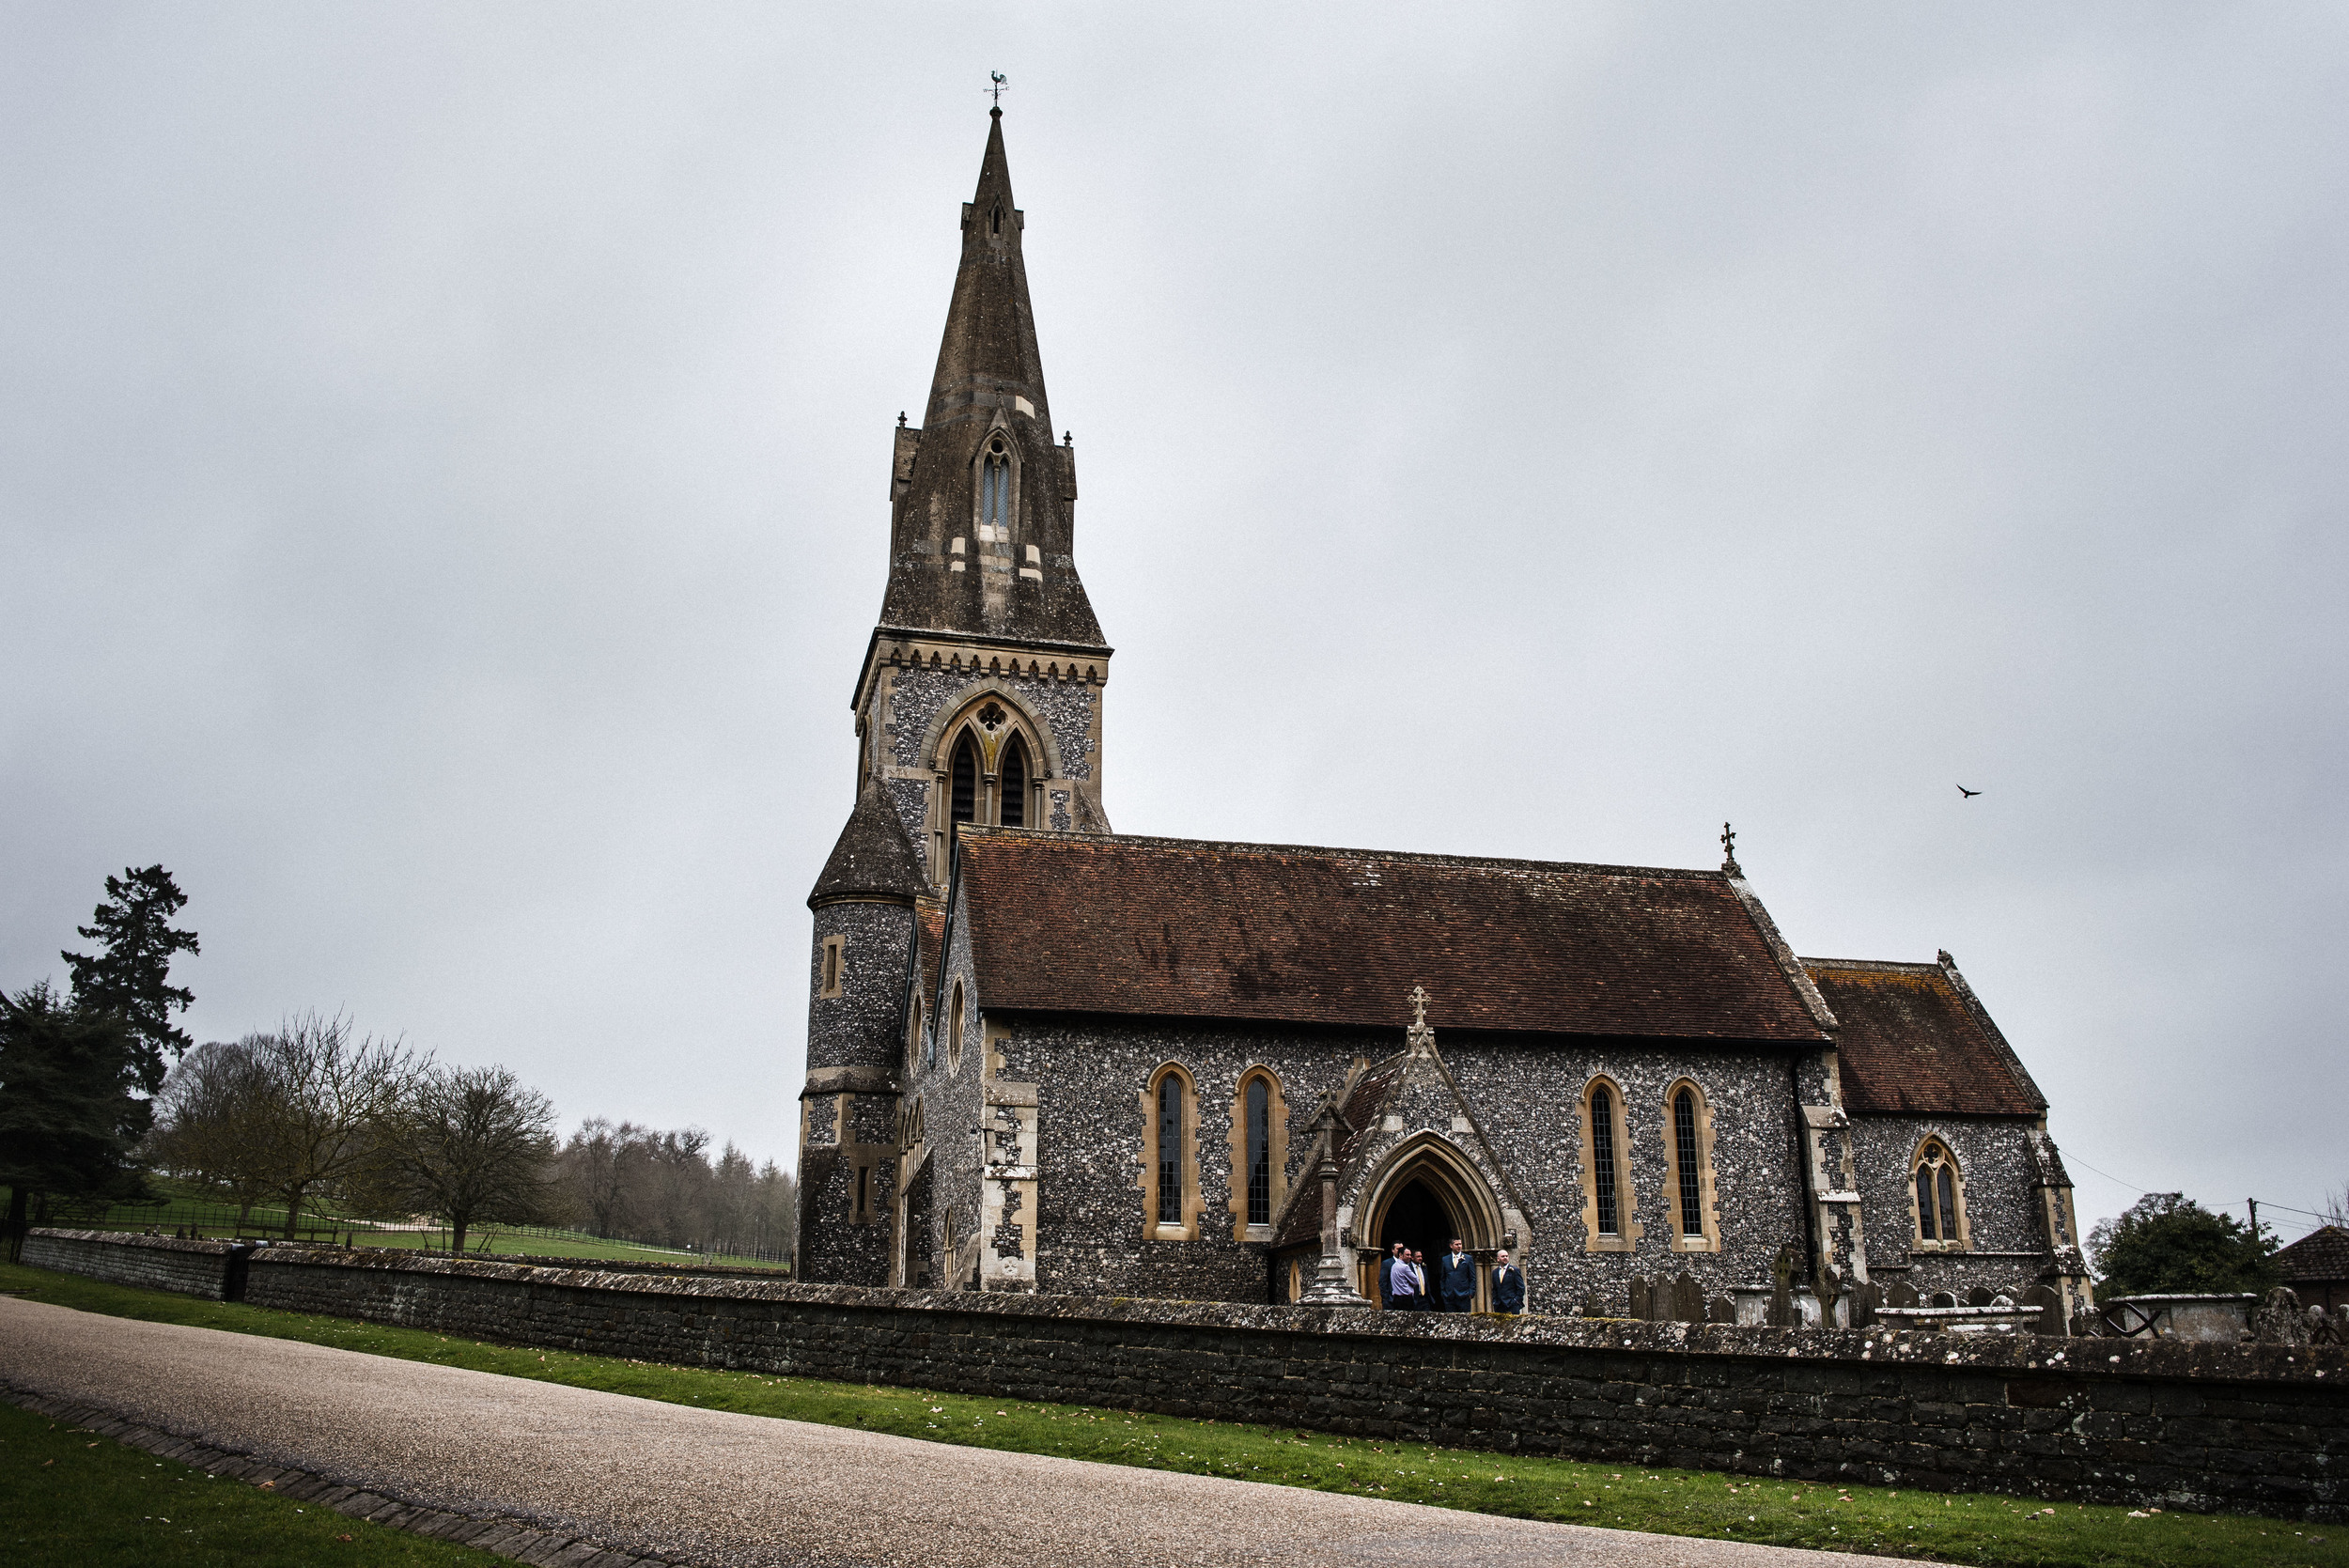 st marks church in Englefield